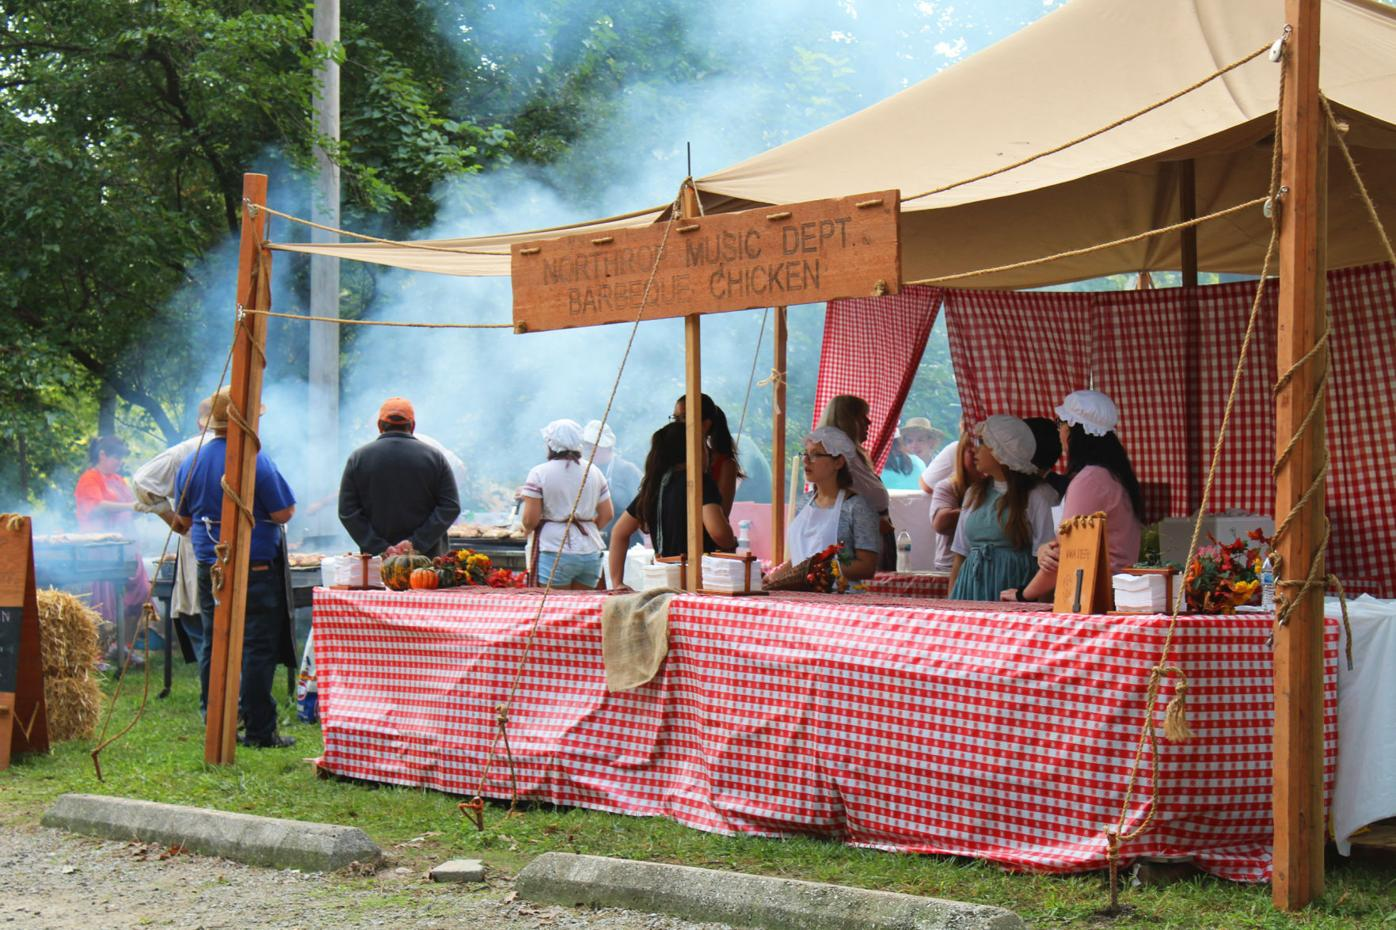 Northrop Music Department food vendor